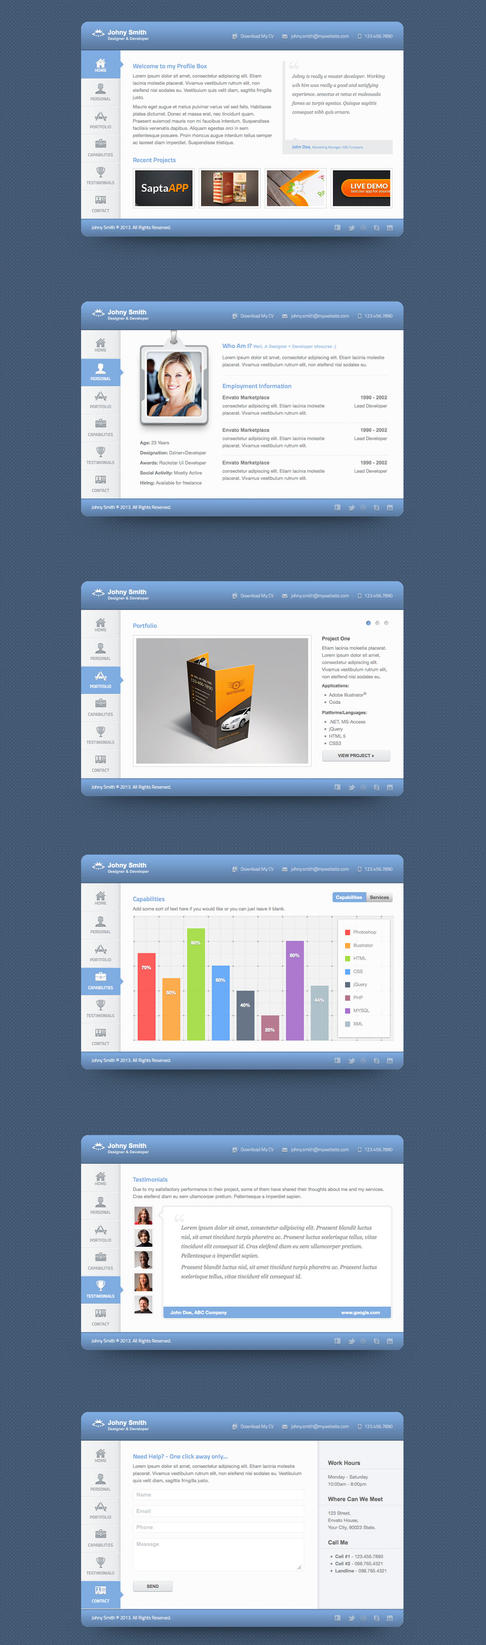 Vcard HTML5 Template by Saptarang